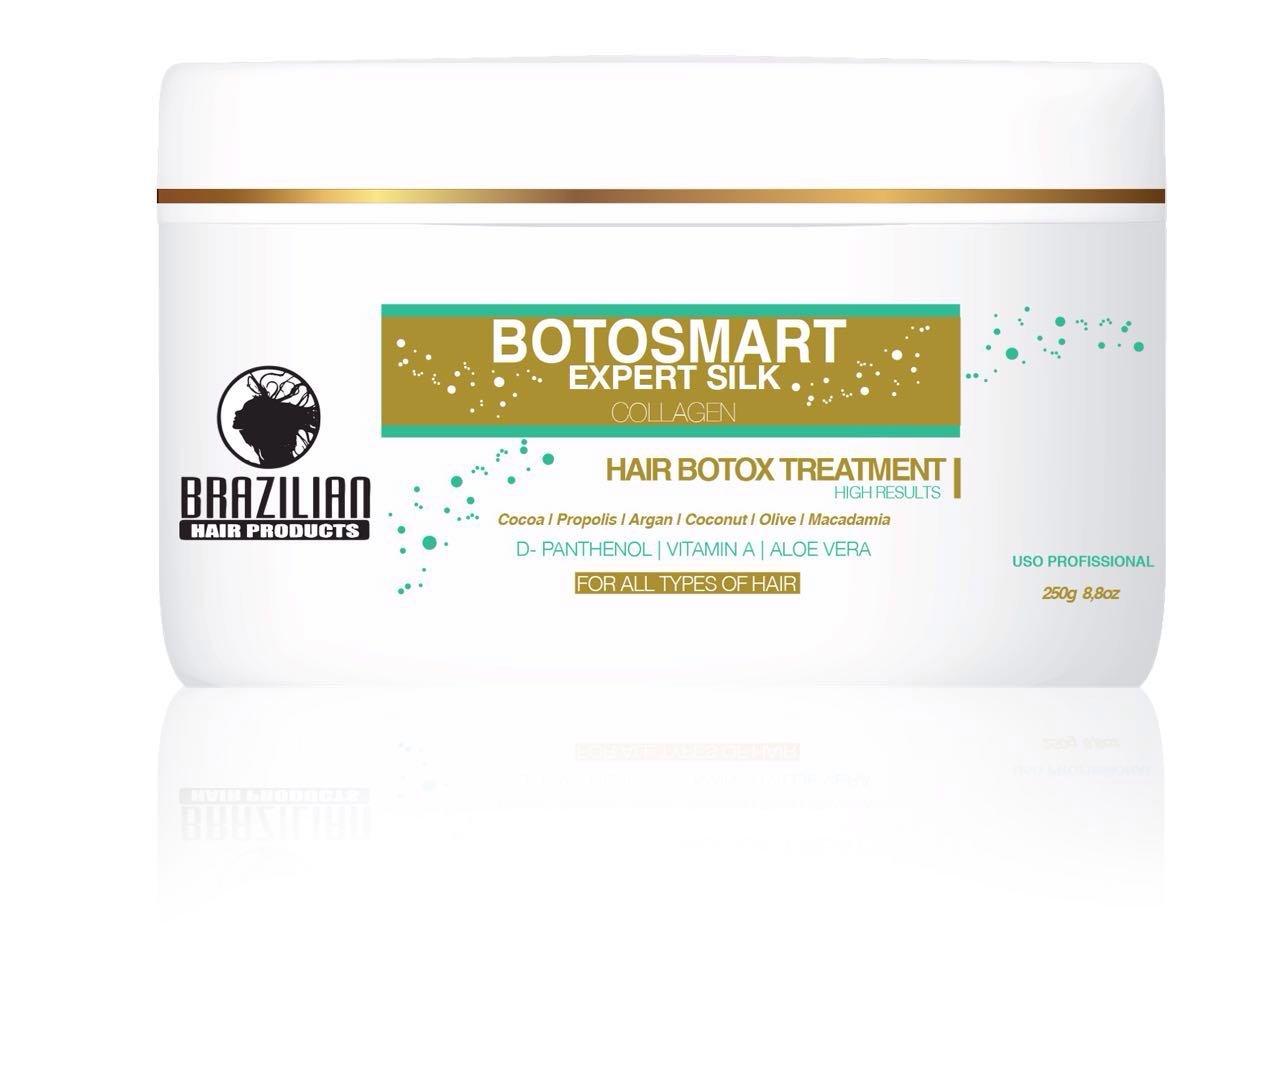 Botosmart Expert Silk Hair Treatment with Collagen with Vitamin A,Aloe Vera